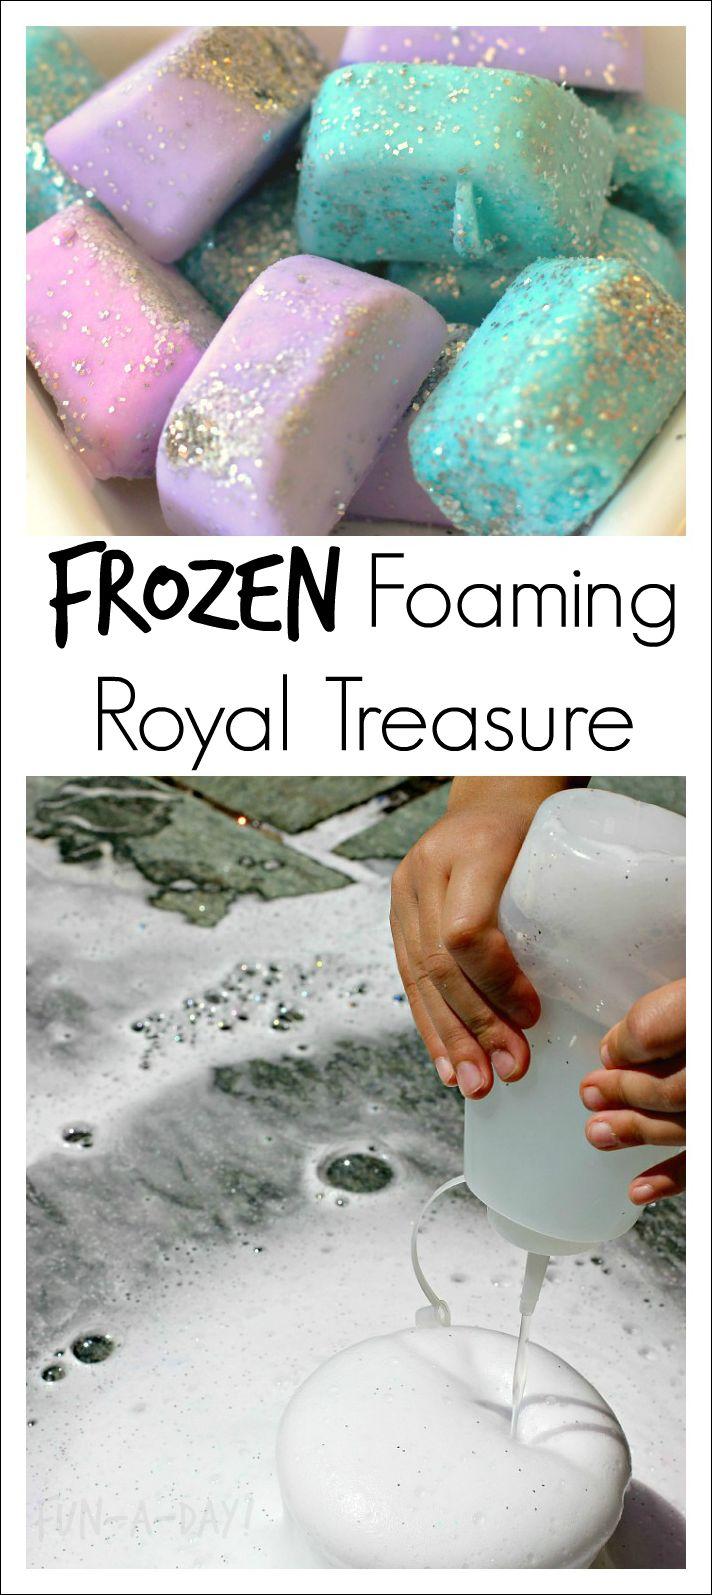 frozen fairy tale science for preschoolers play activities for kids preschool science. Black Bedroom Furniture Sets. Home Design Ideas